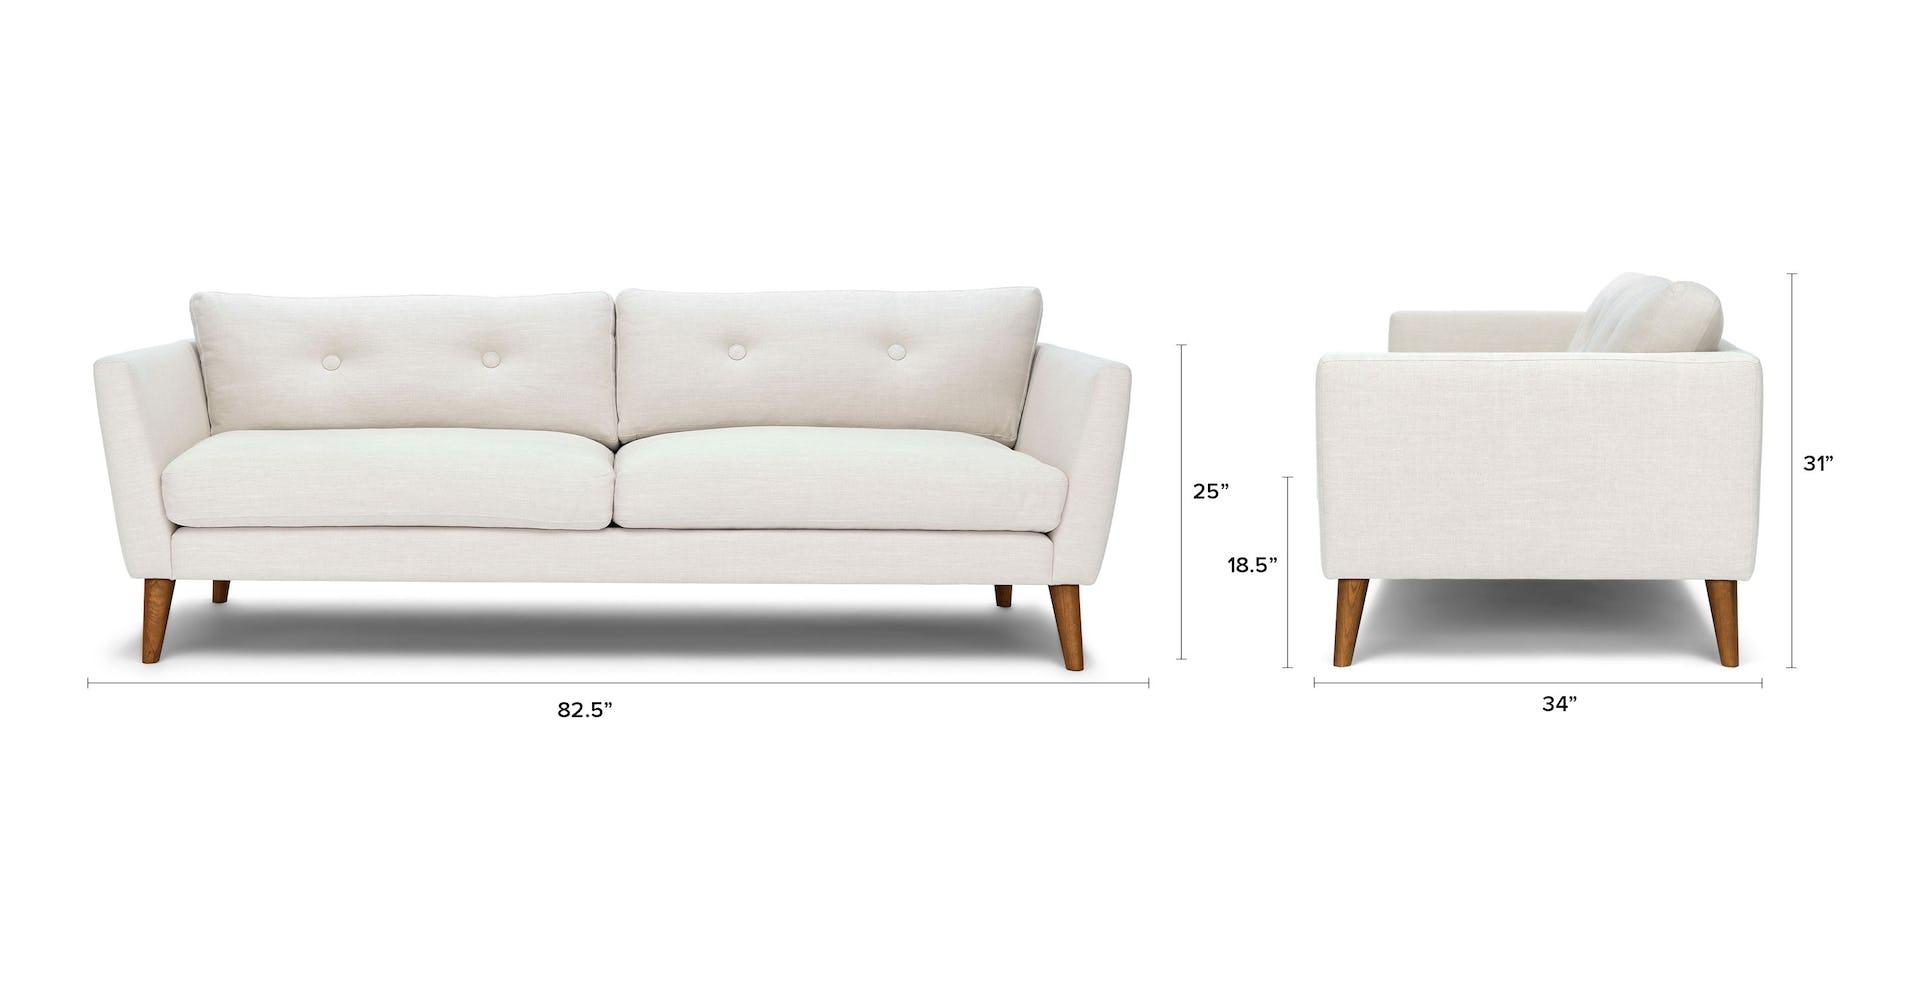 Peachy Emil Quartz White Sofa Theyellowbook Wood Chair Design Ideas Theyellowbookinfo